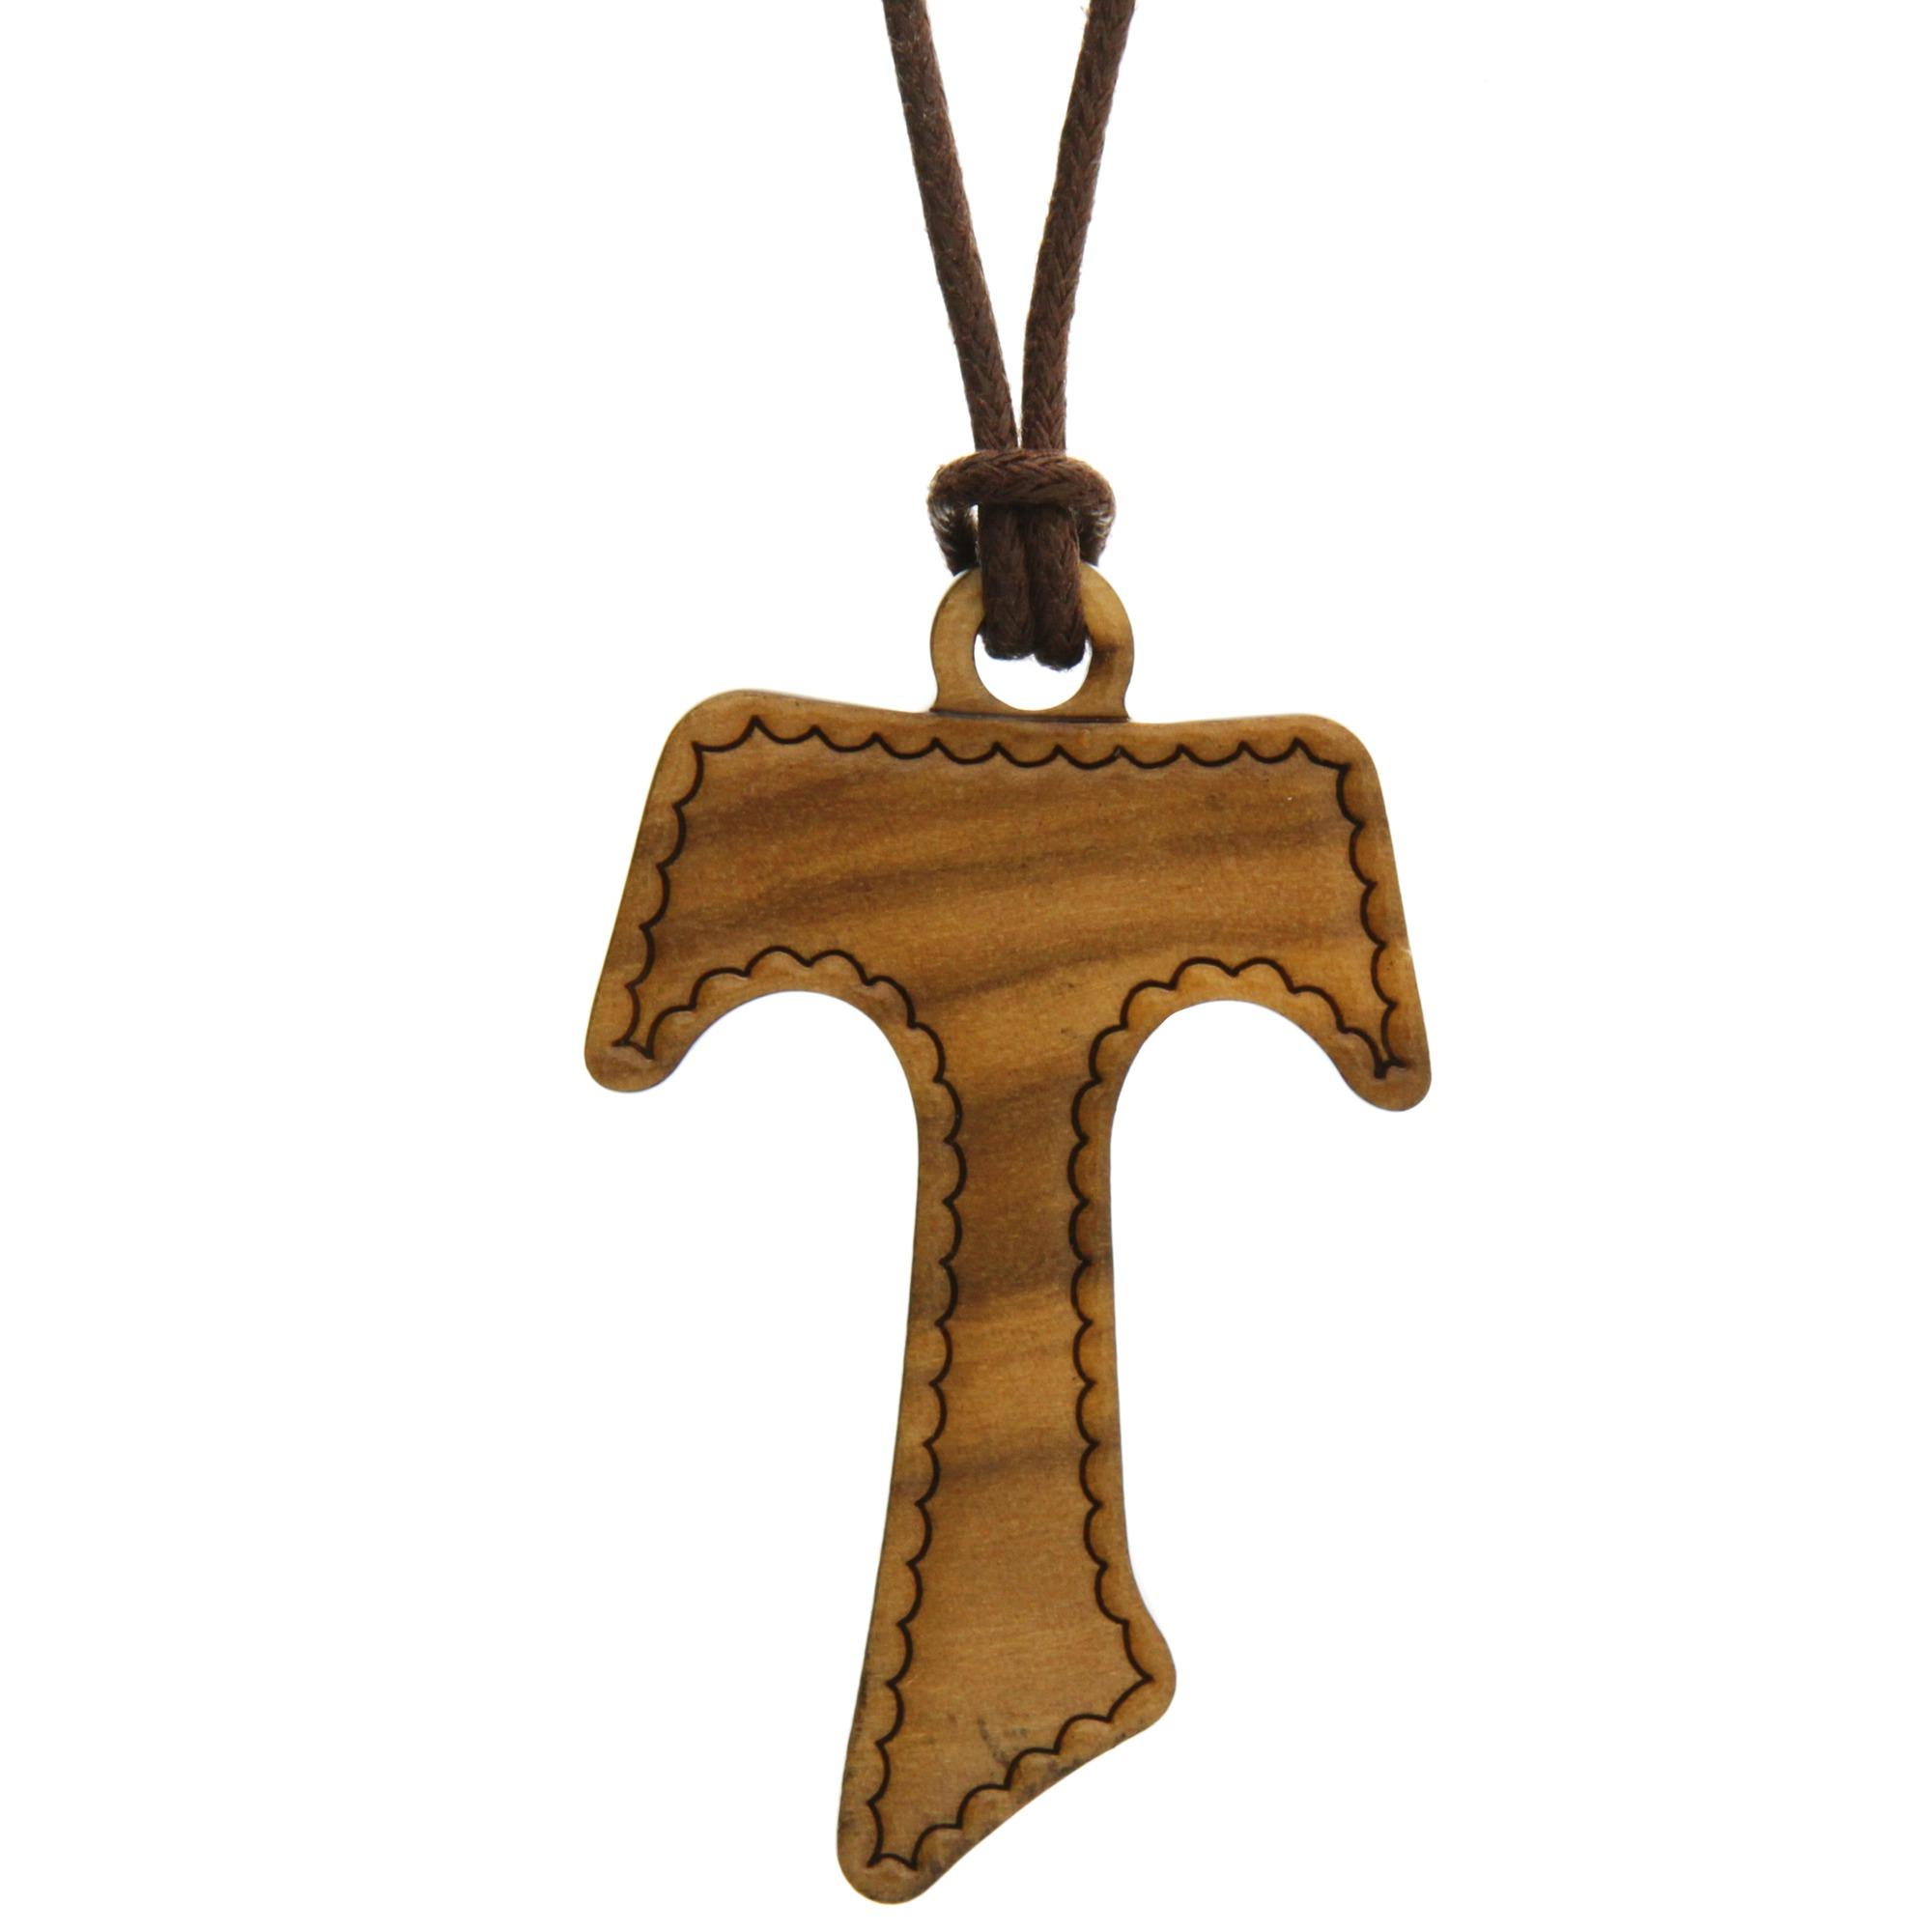 d46f84febe0 Tau Wood Cross Necklace | The Catholic Company